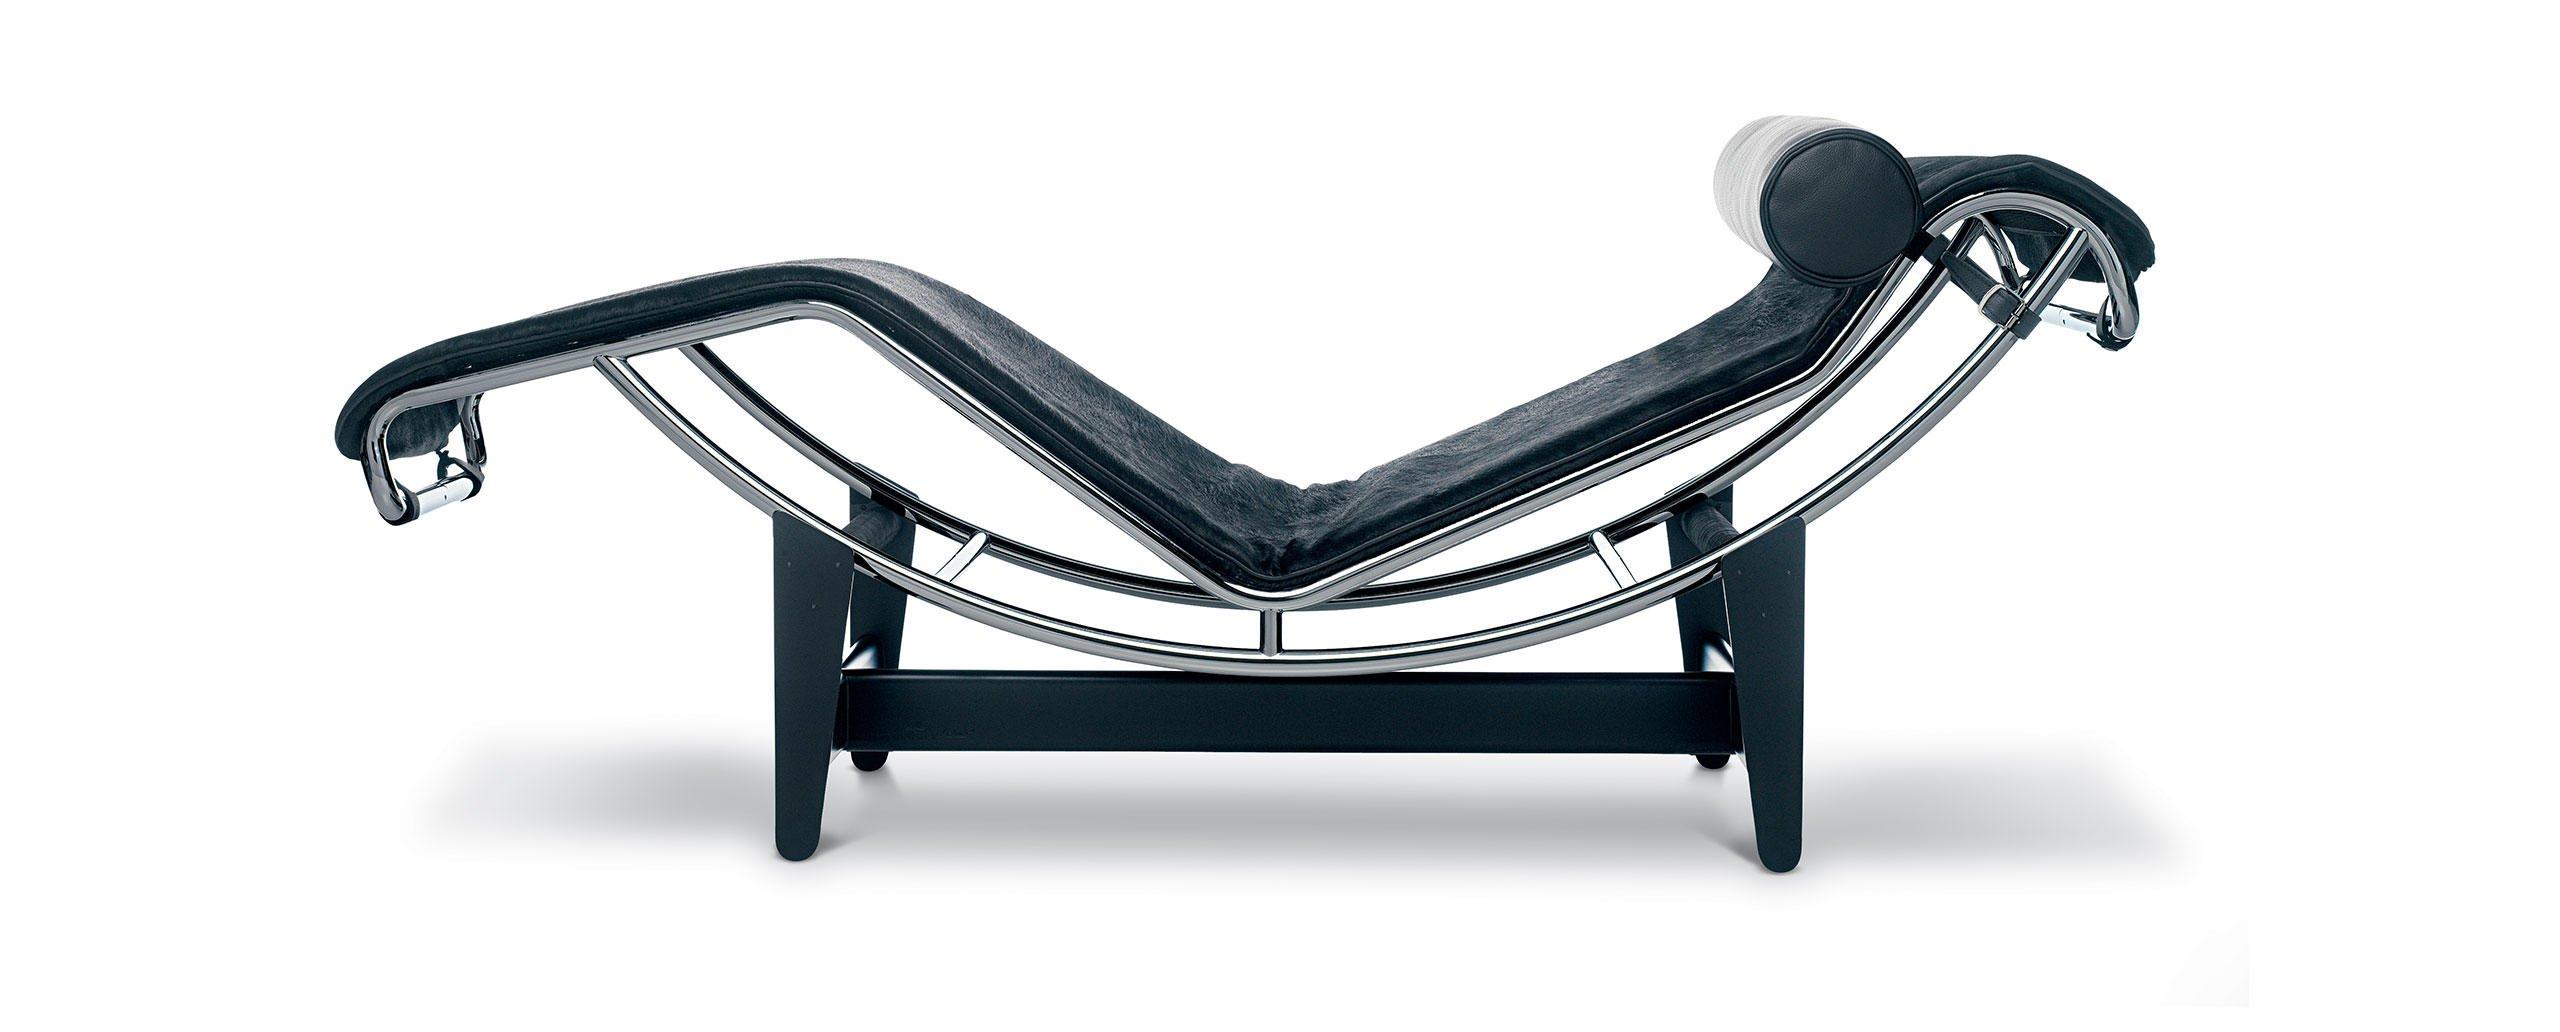 Le Corbusier'in Şezlong Koltuğu (Chaise Longue)